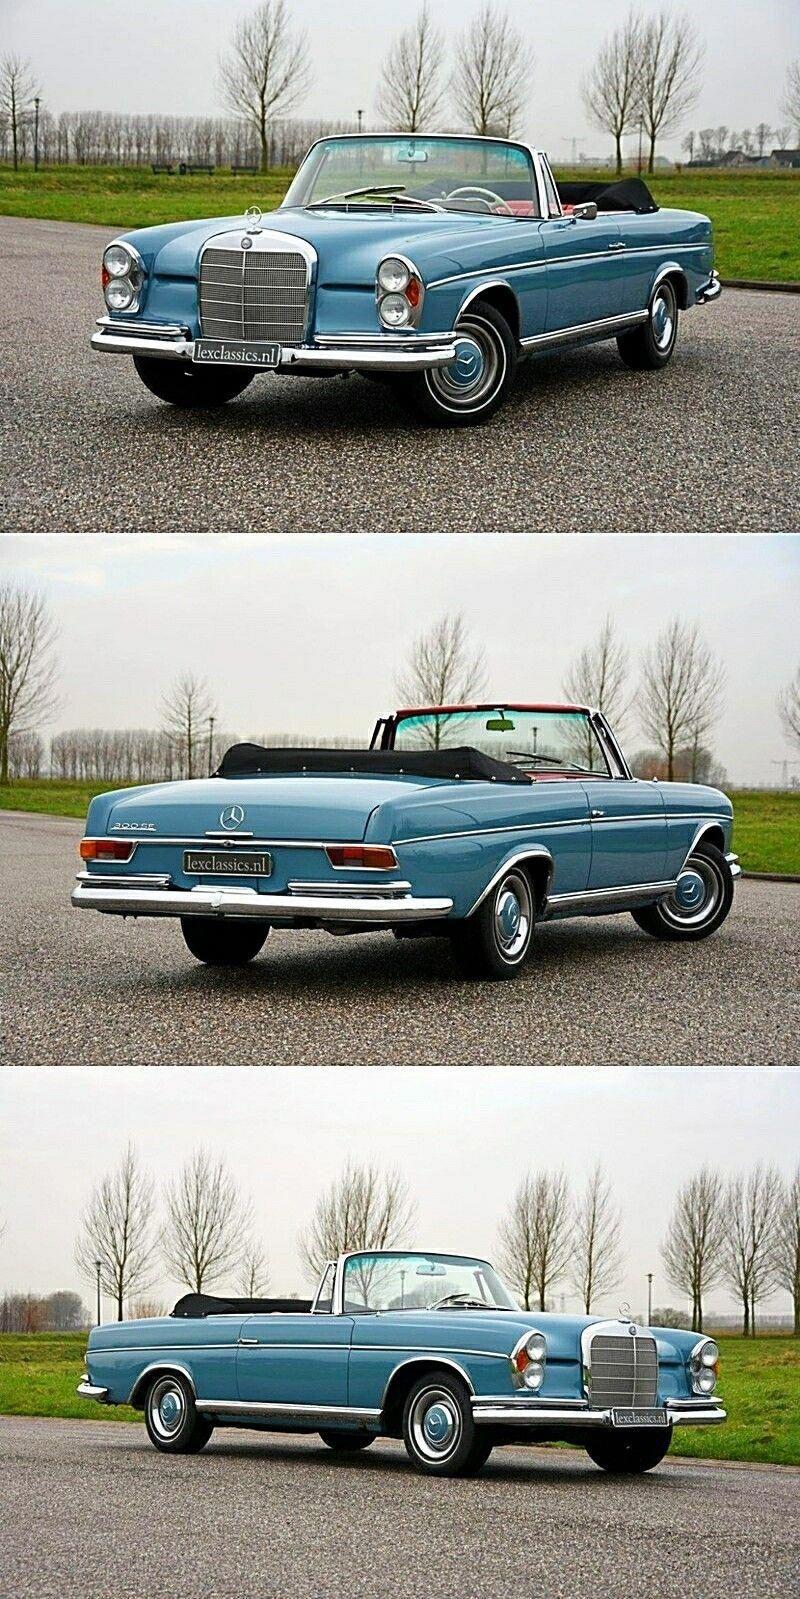 1964 Mercedes Benz 300 SE Cabriolet. - W112 #Mercedesclassiccars #BMWclassiccars